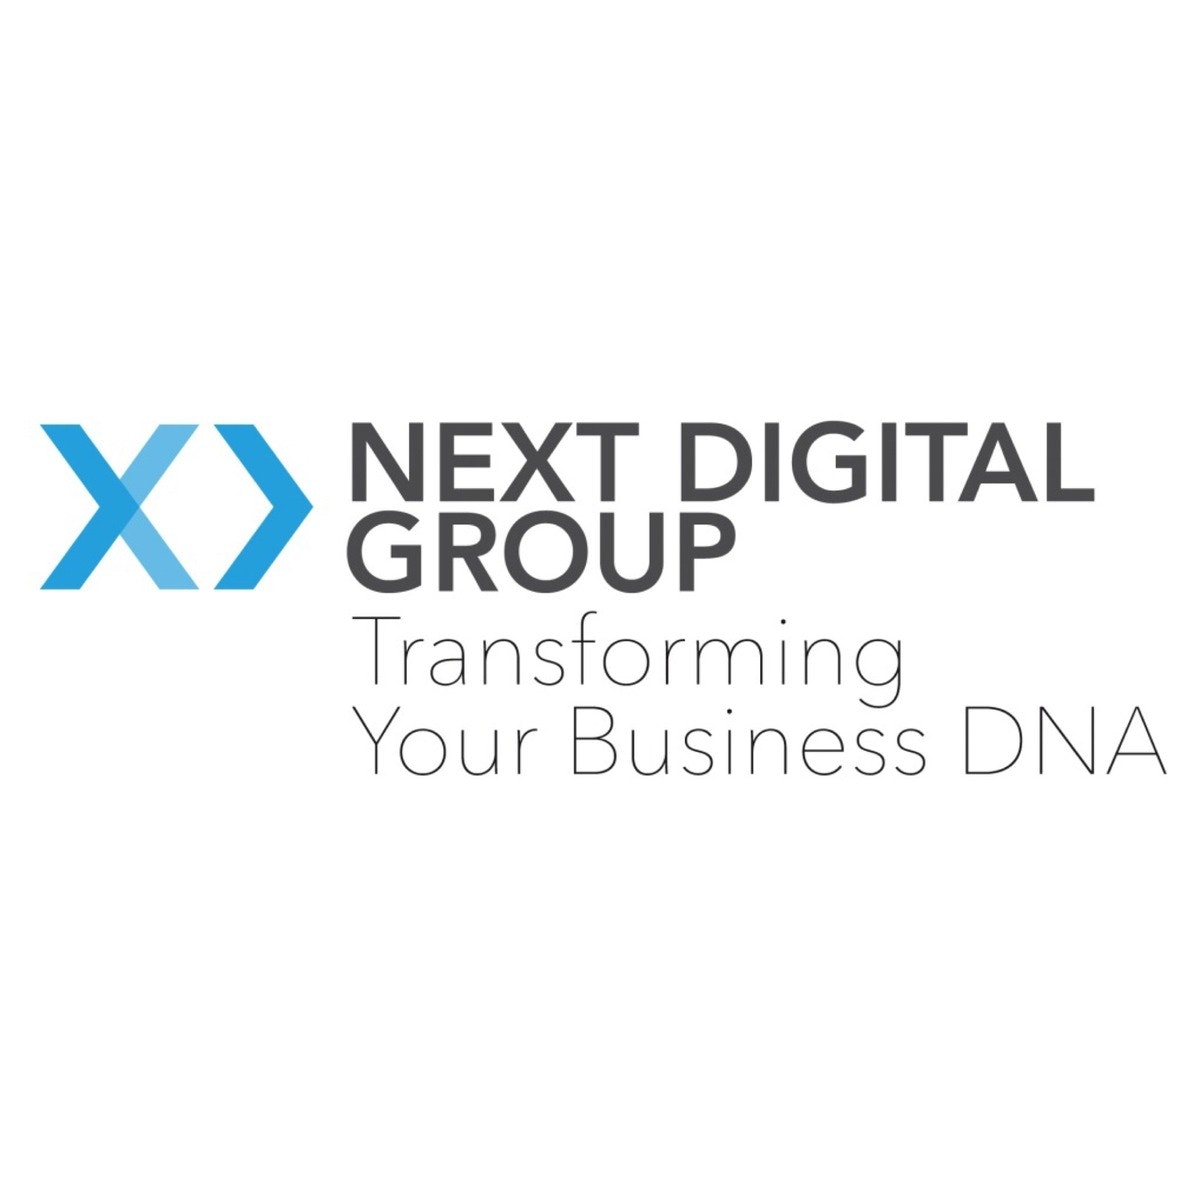 Next Digital Group